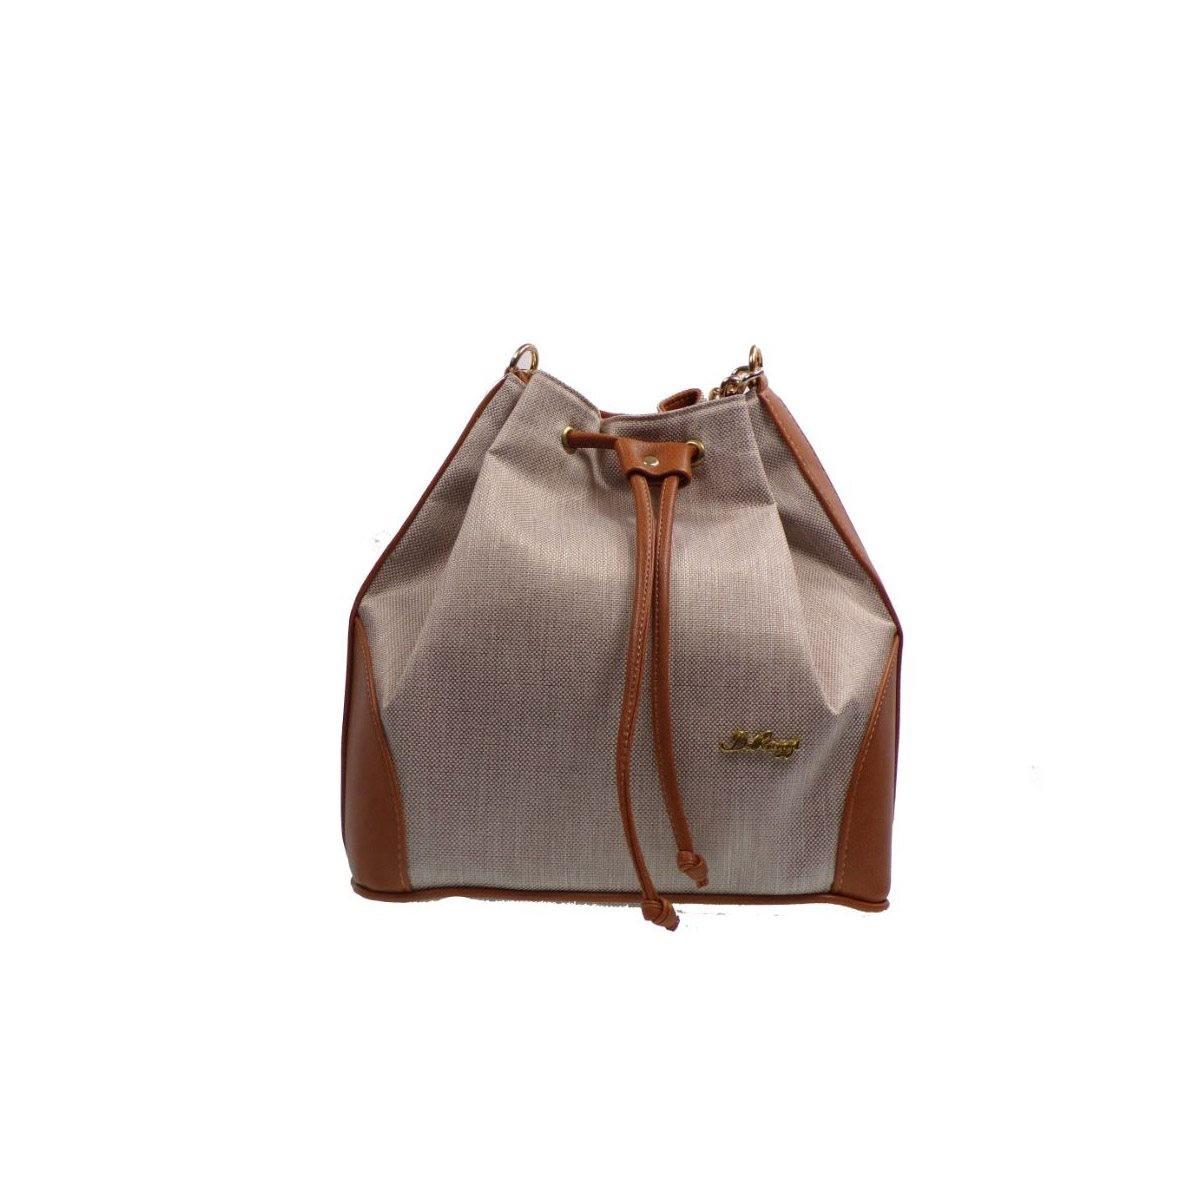 BagiotaShoes - Κορυφαία προϊόντα για ολοκληρωμένα Outfit - Σελίδα 4 ... 8e7aaf4ac26